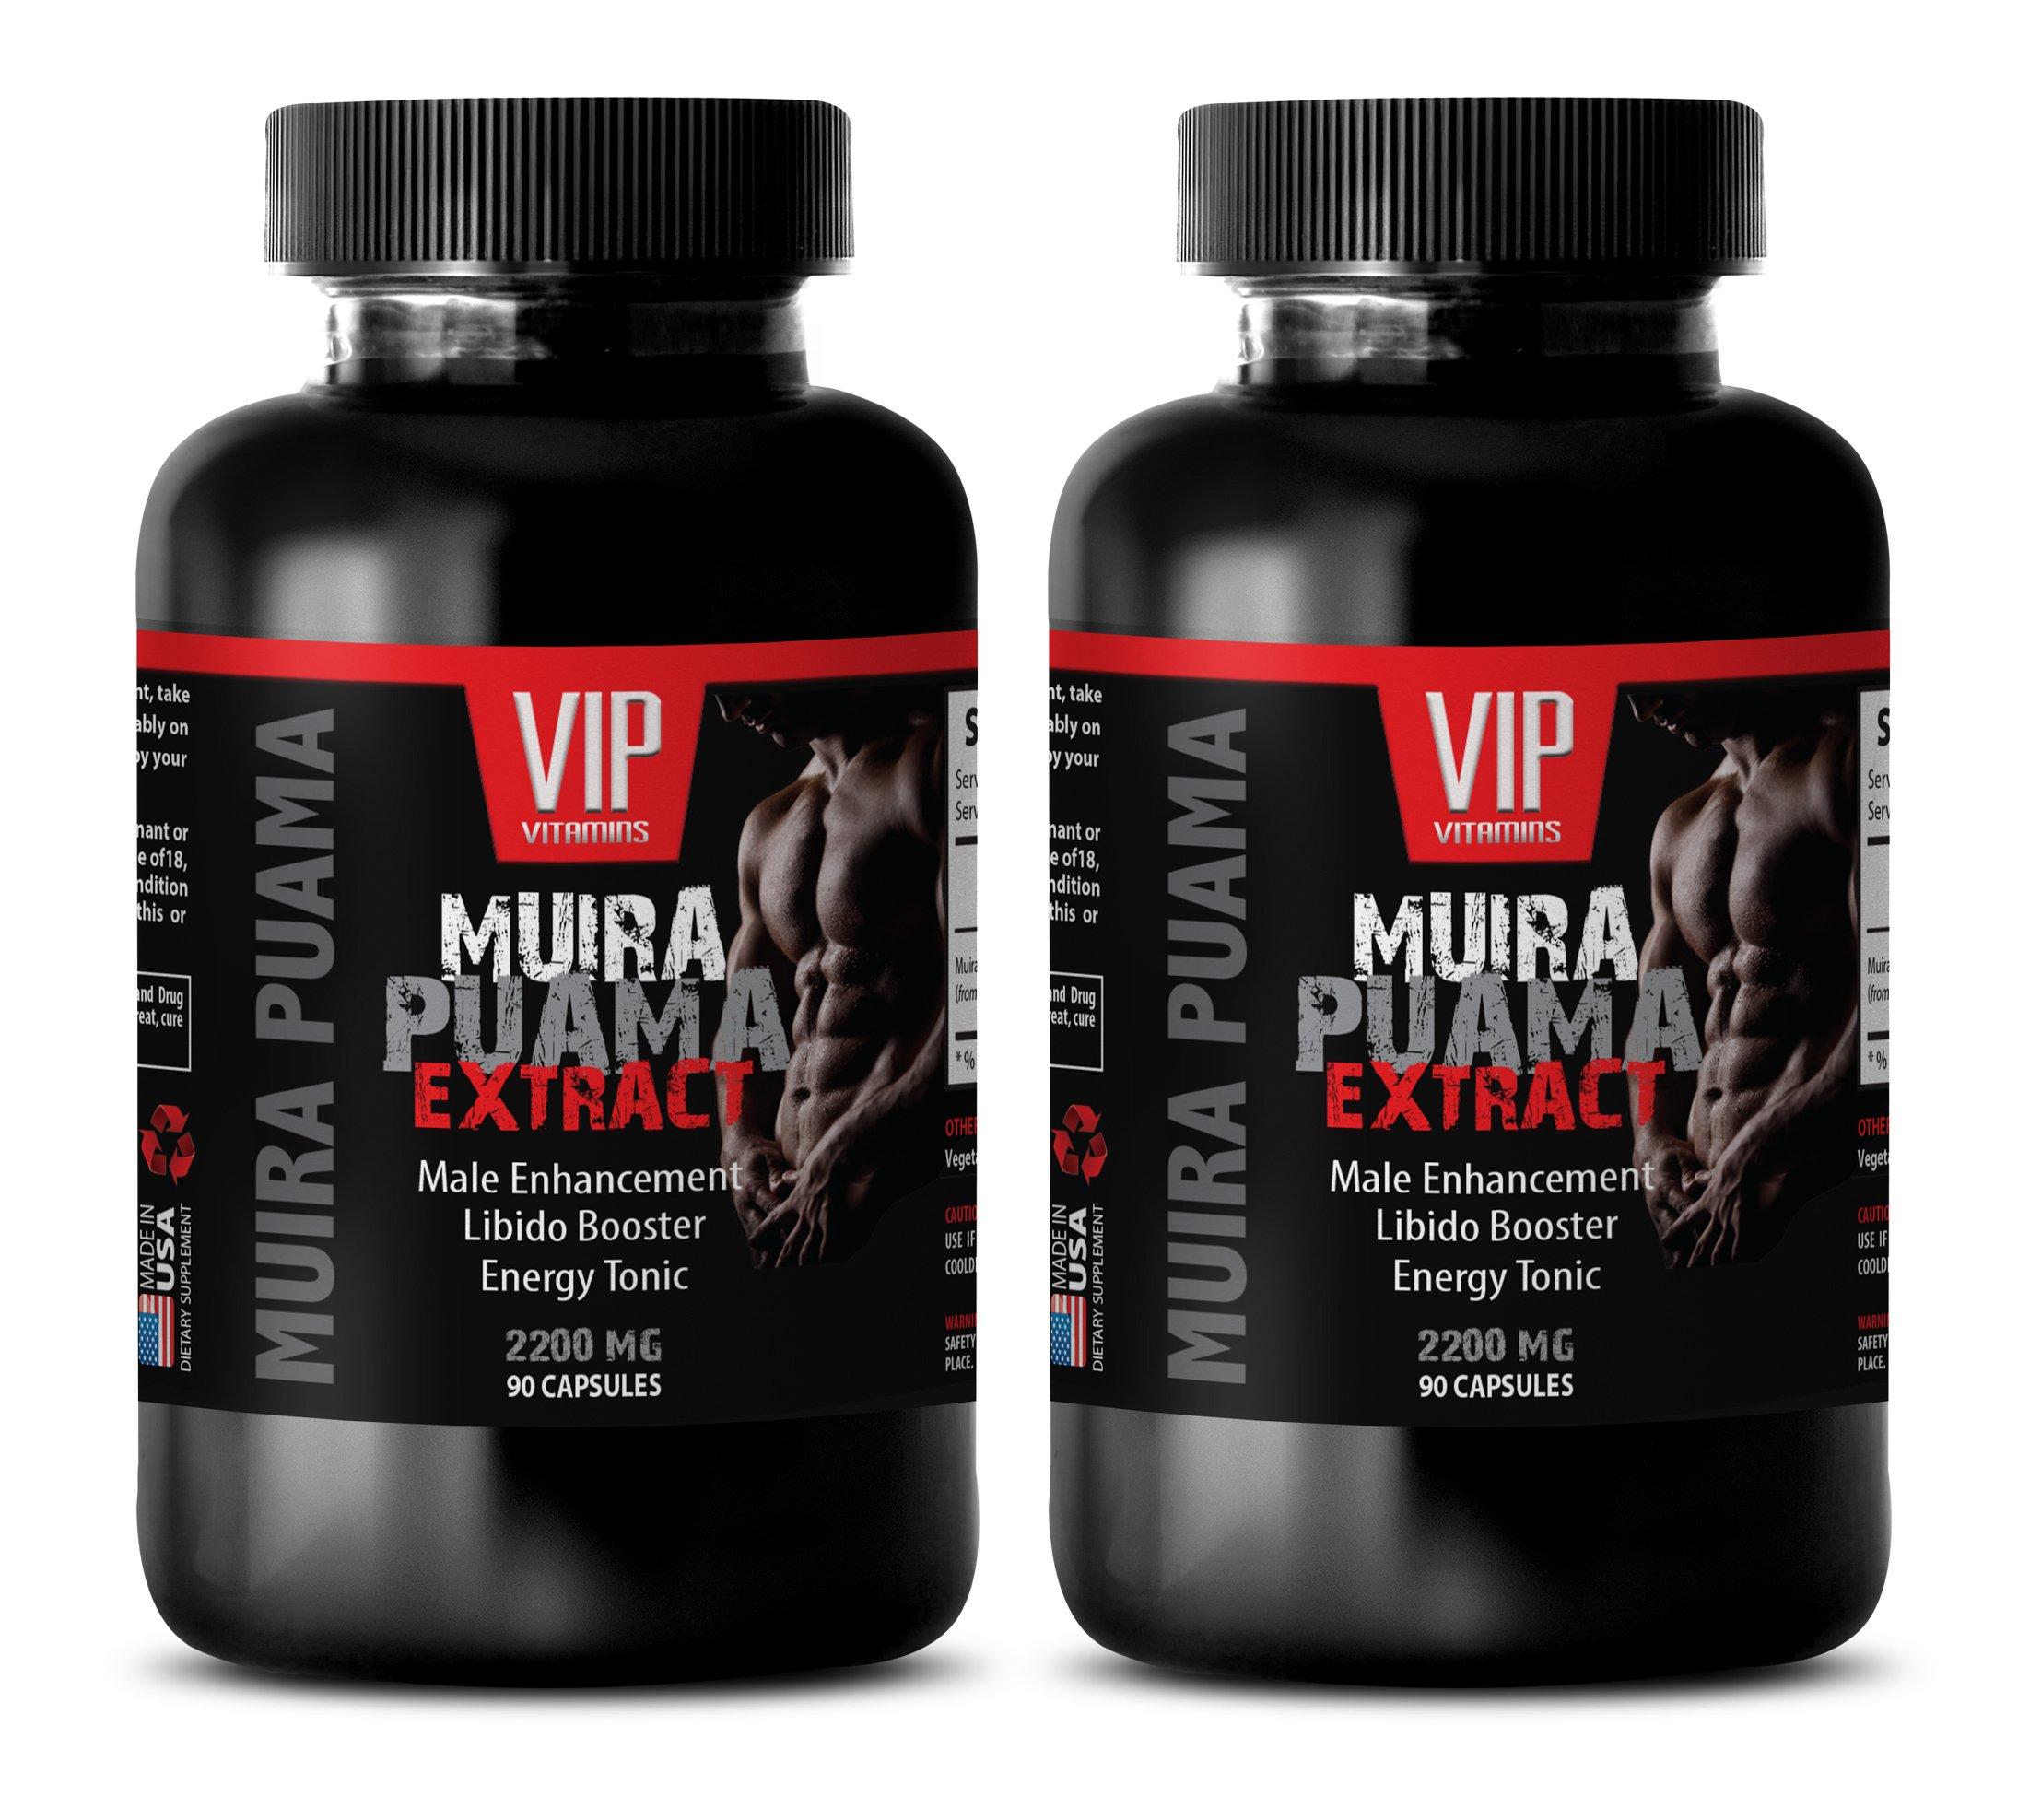 pills for men to last longer - MUIRA PUAMA - brain memory - 2 Bottles (180 Capsules) by VIP Supplements